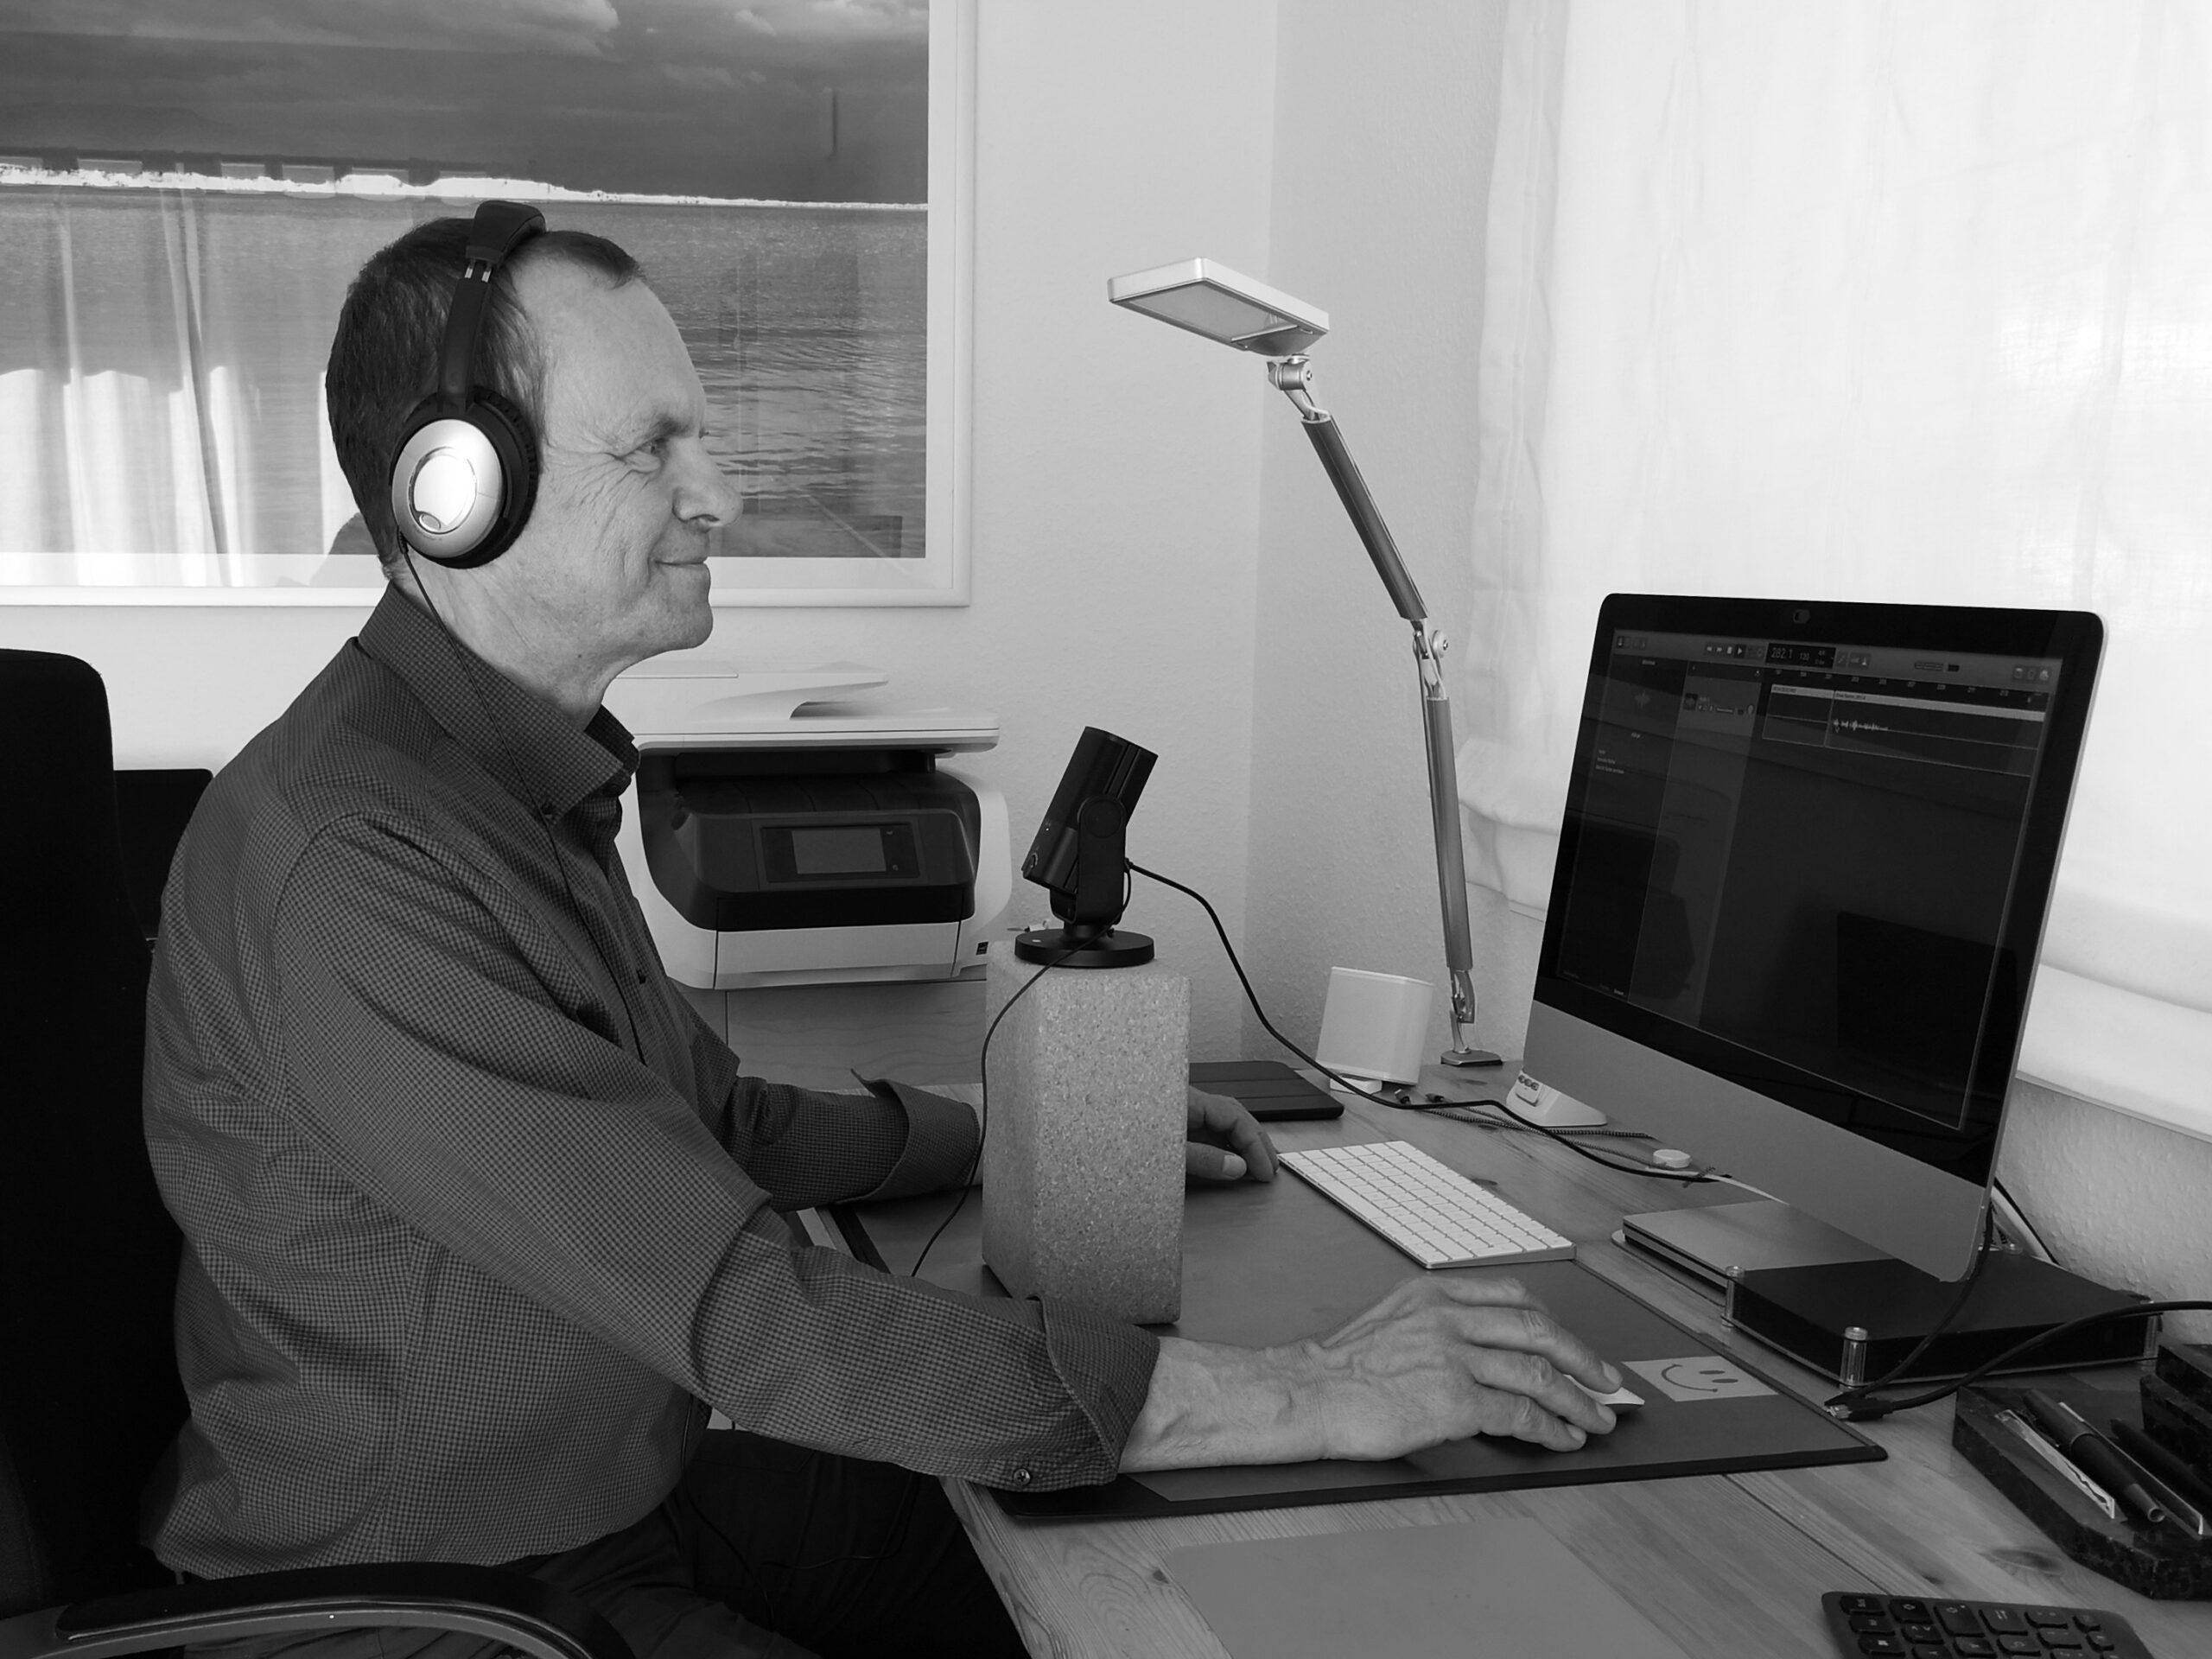 Corona Podcast mkit Prof. Dr. Jürgen Krahl, TH-OWL